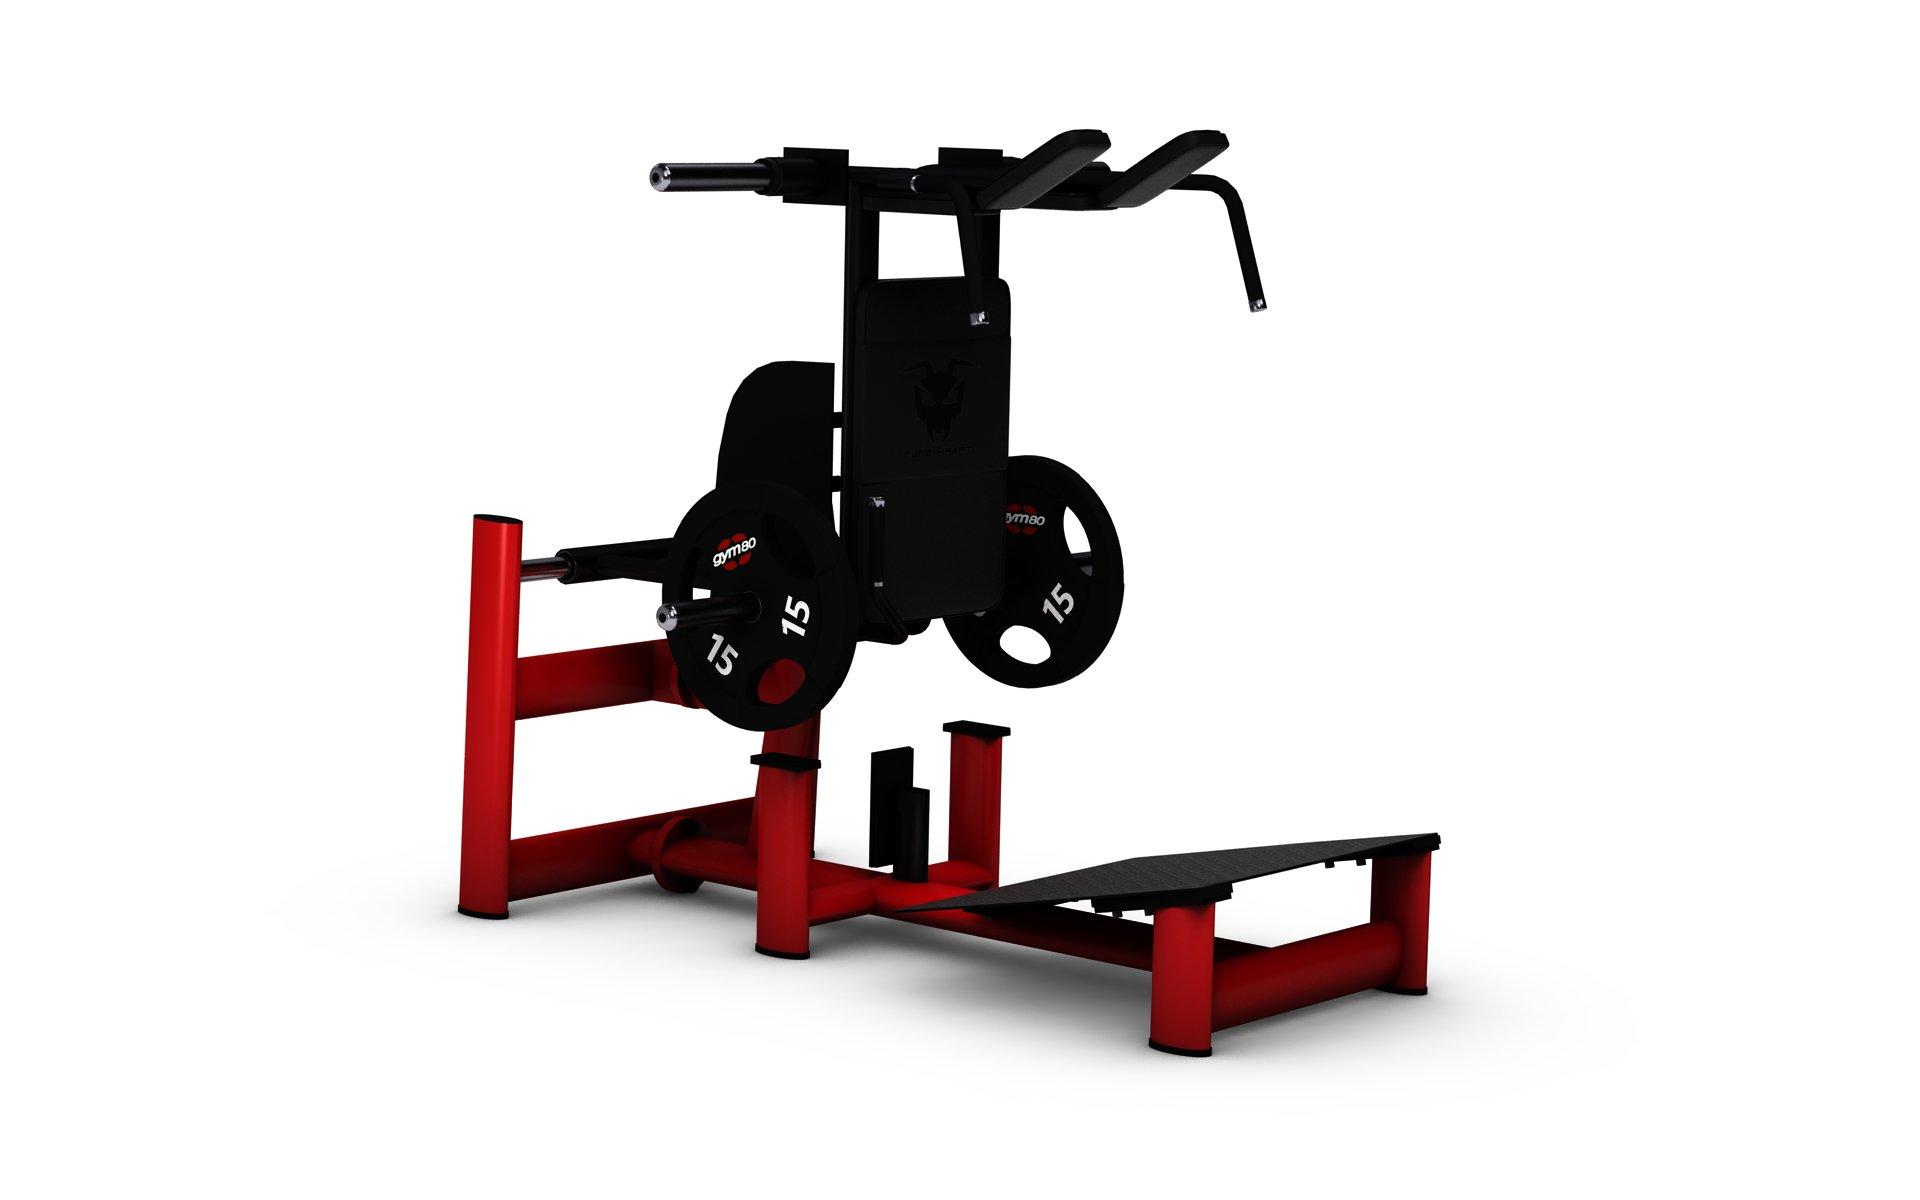 gym80 Pure Kraft Squat Machine